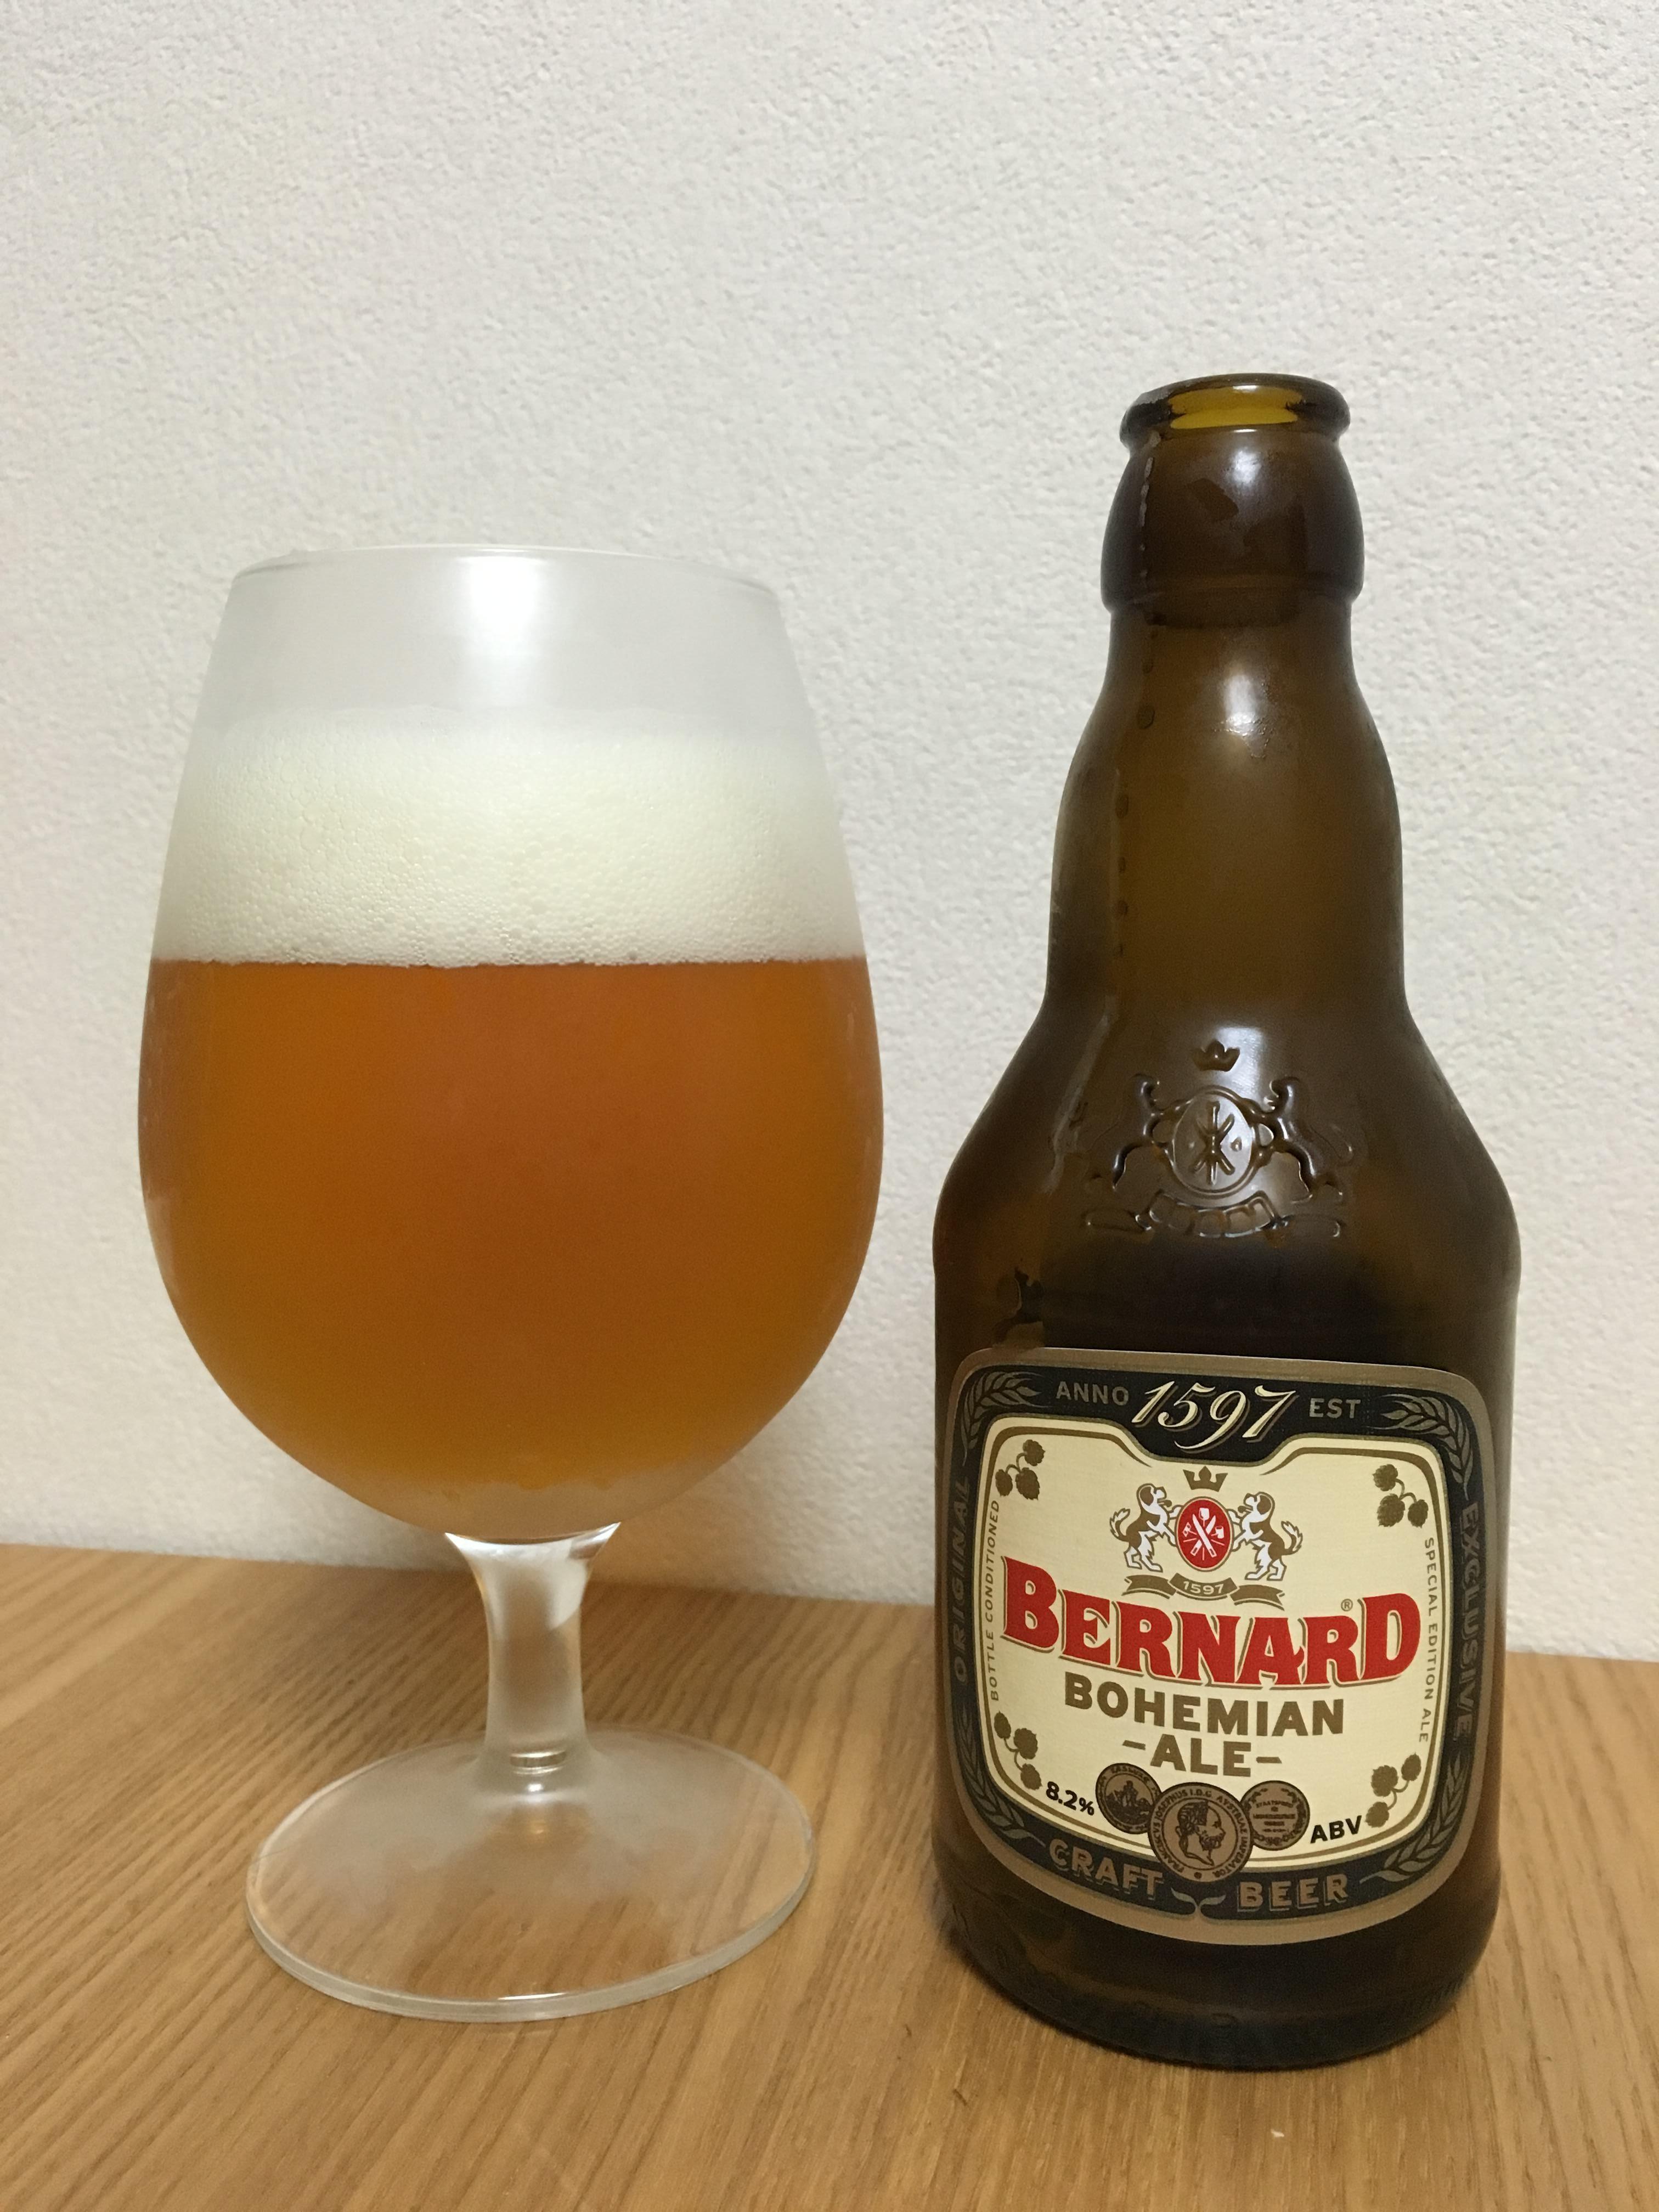 BERNARD BOHEMIAN ALE(ベルナルド ボヘミアン エール)